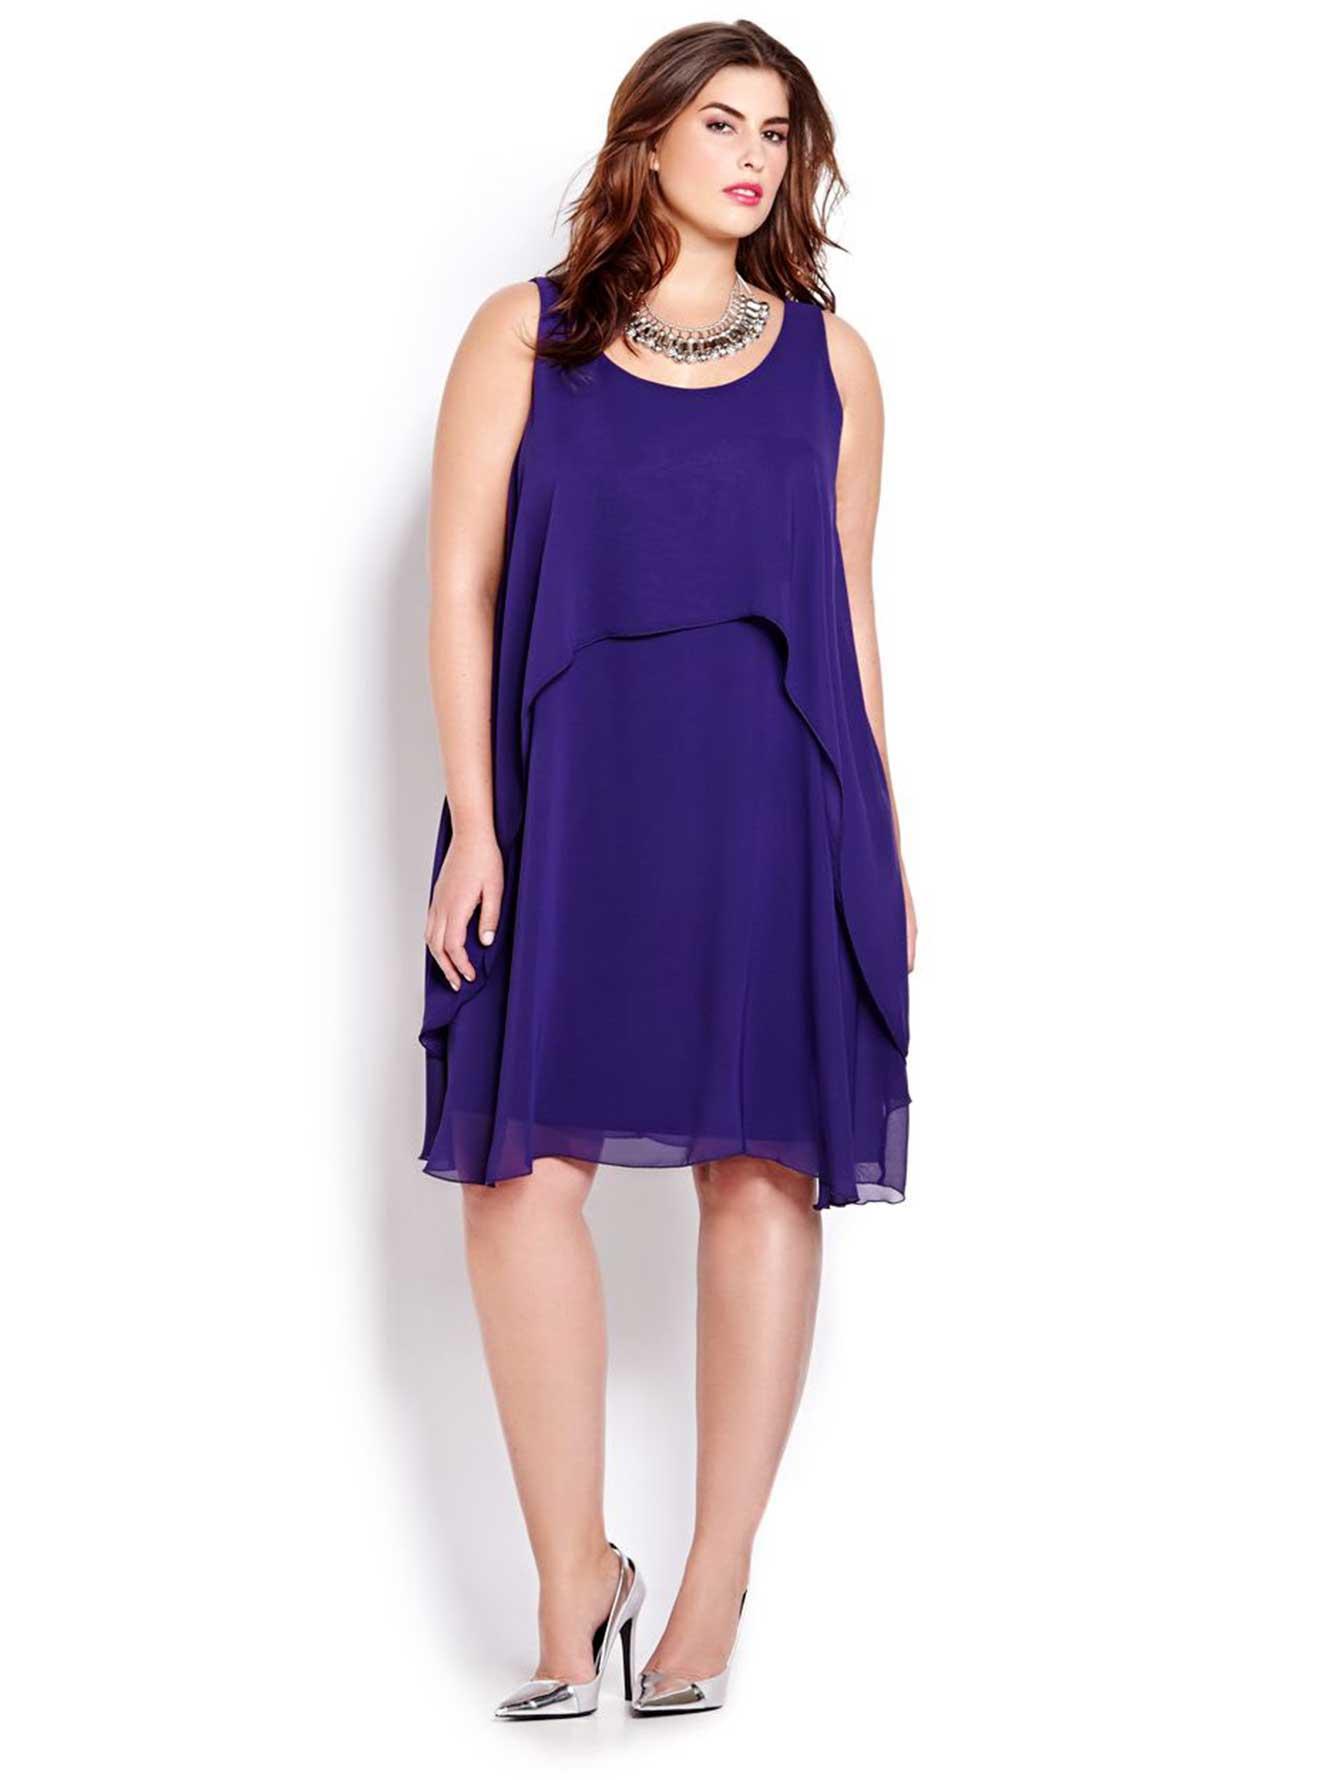 36c93cbb33b7 Sleeveless Chiffon Dress | Addition Elle